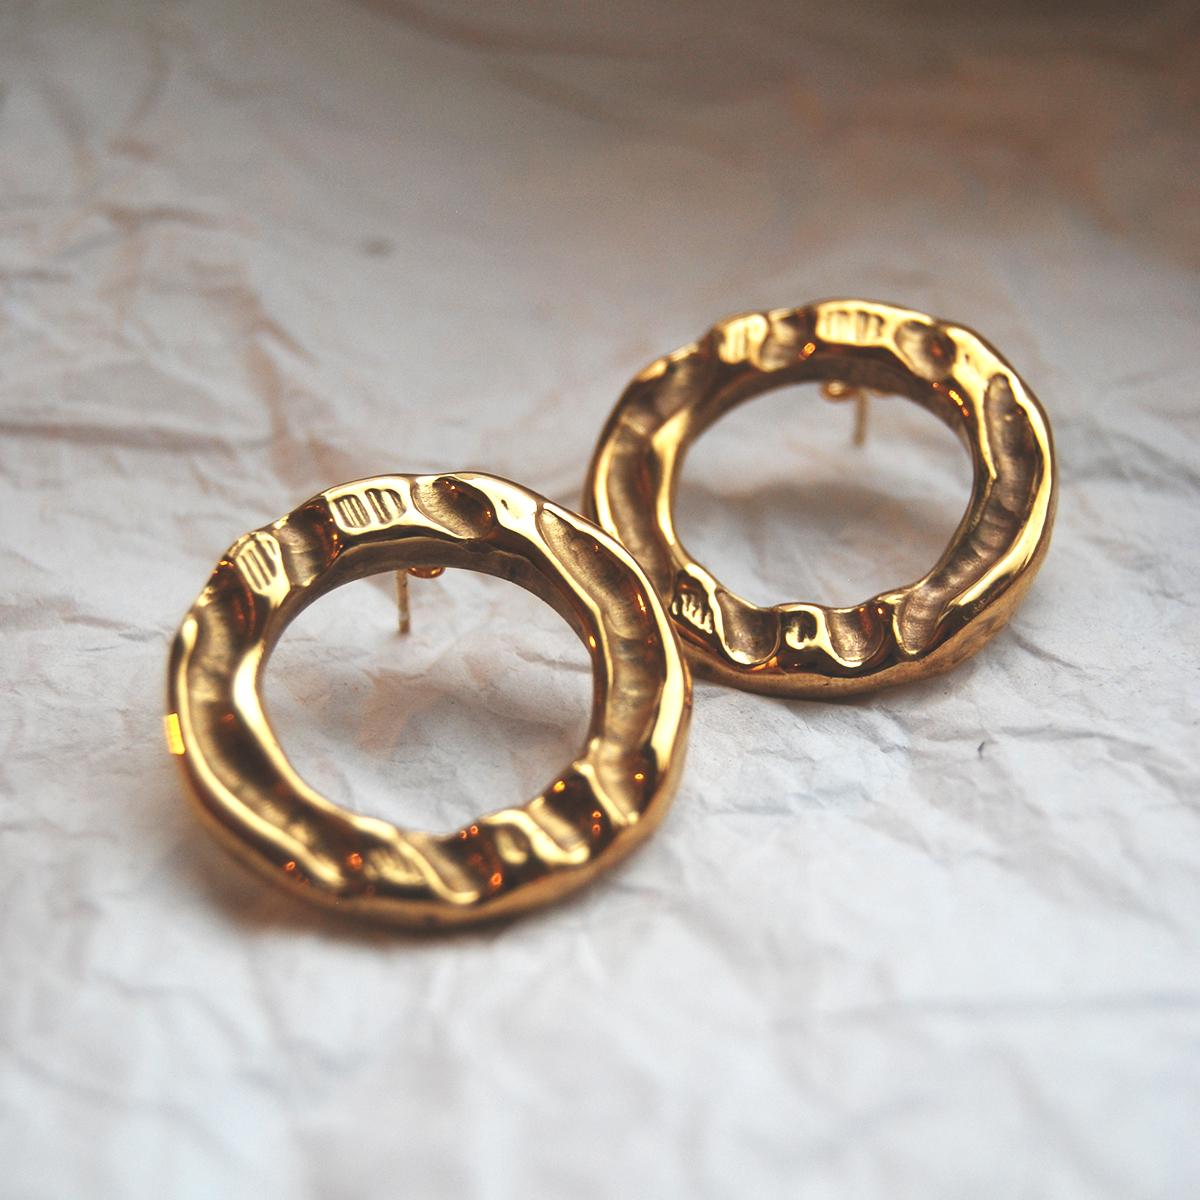 Textured circle earrings